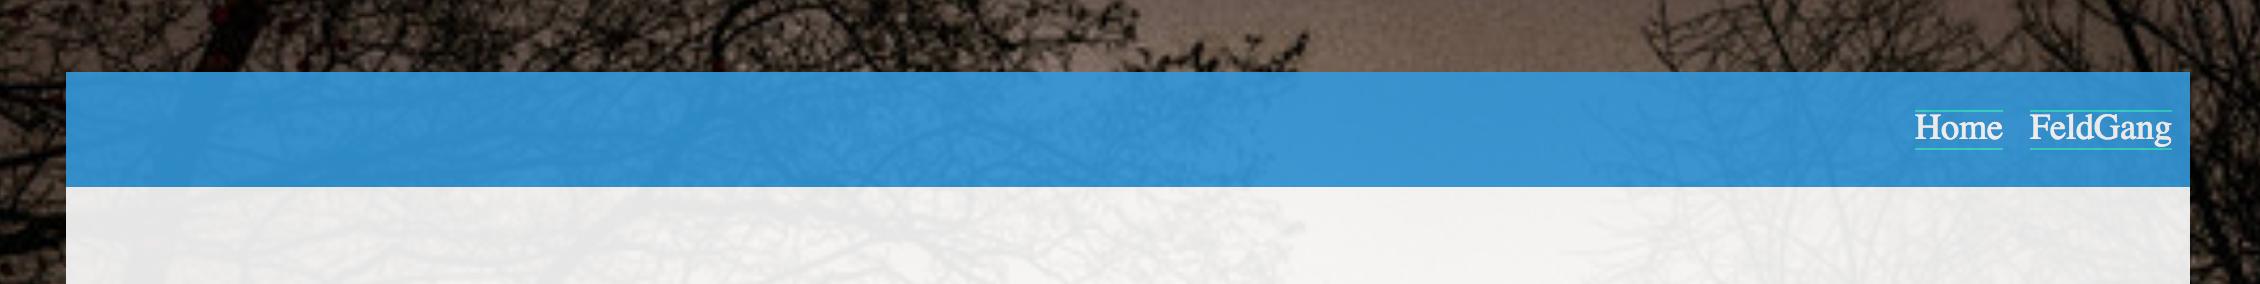 screenshot of nav with borders